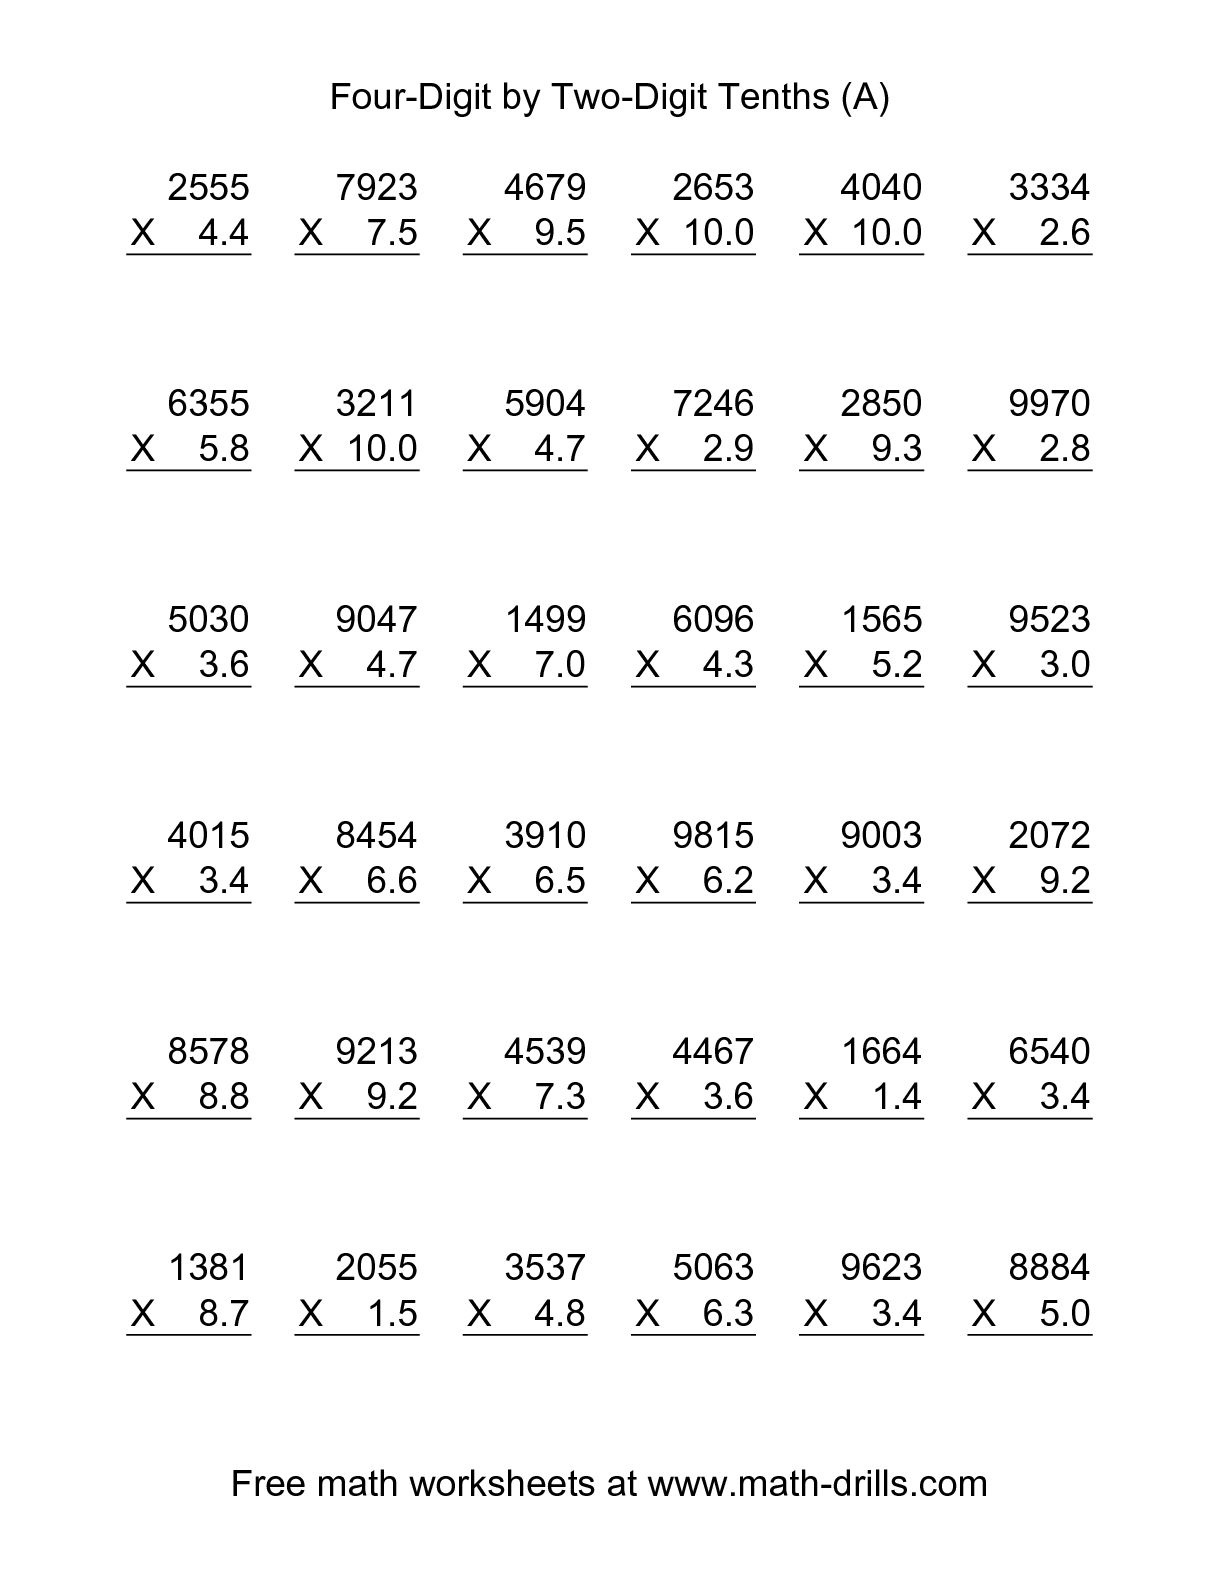 Multiplication Worksheets With Decimals : Cmediadrivers - Free Printable Multiplying Decimals Worksheets